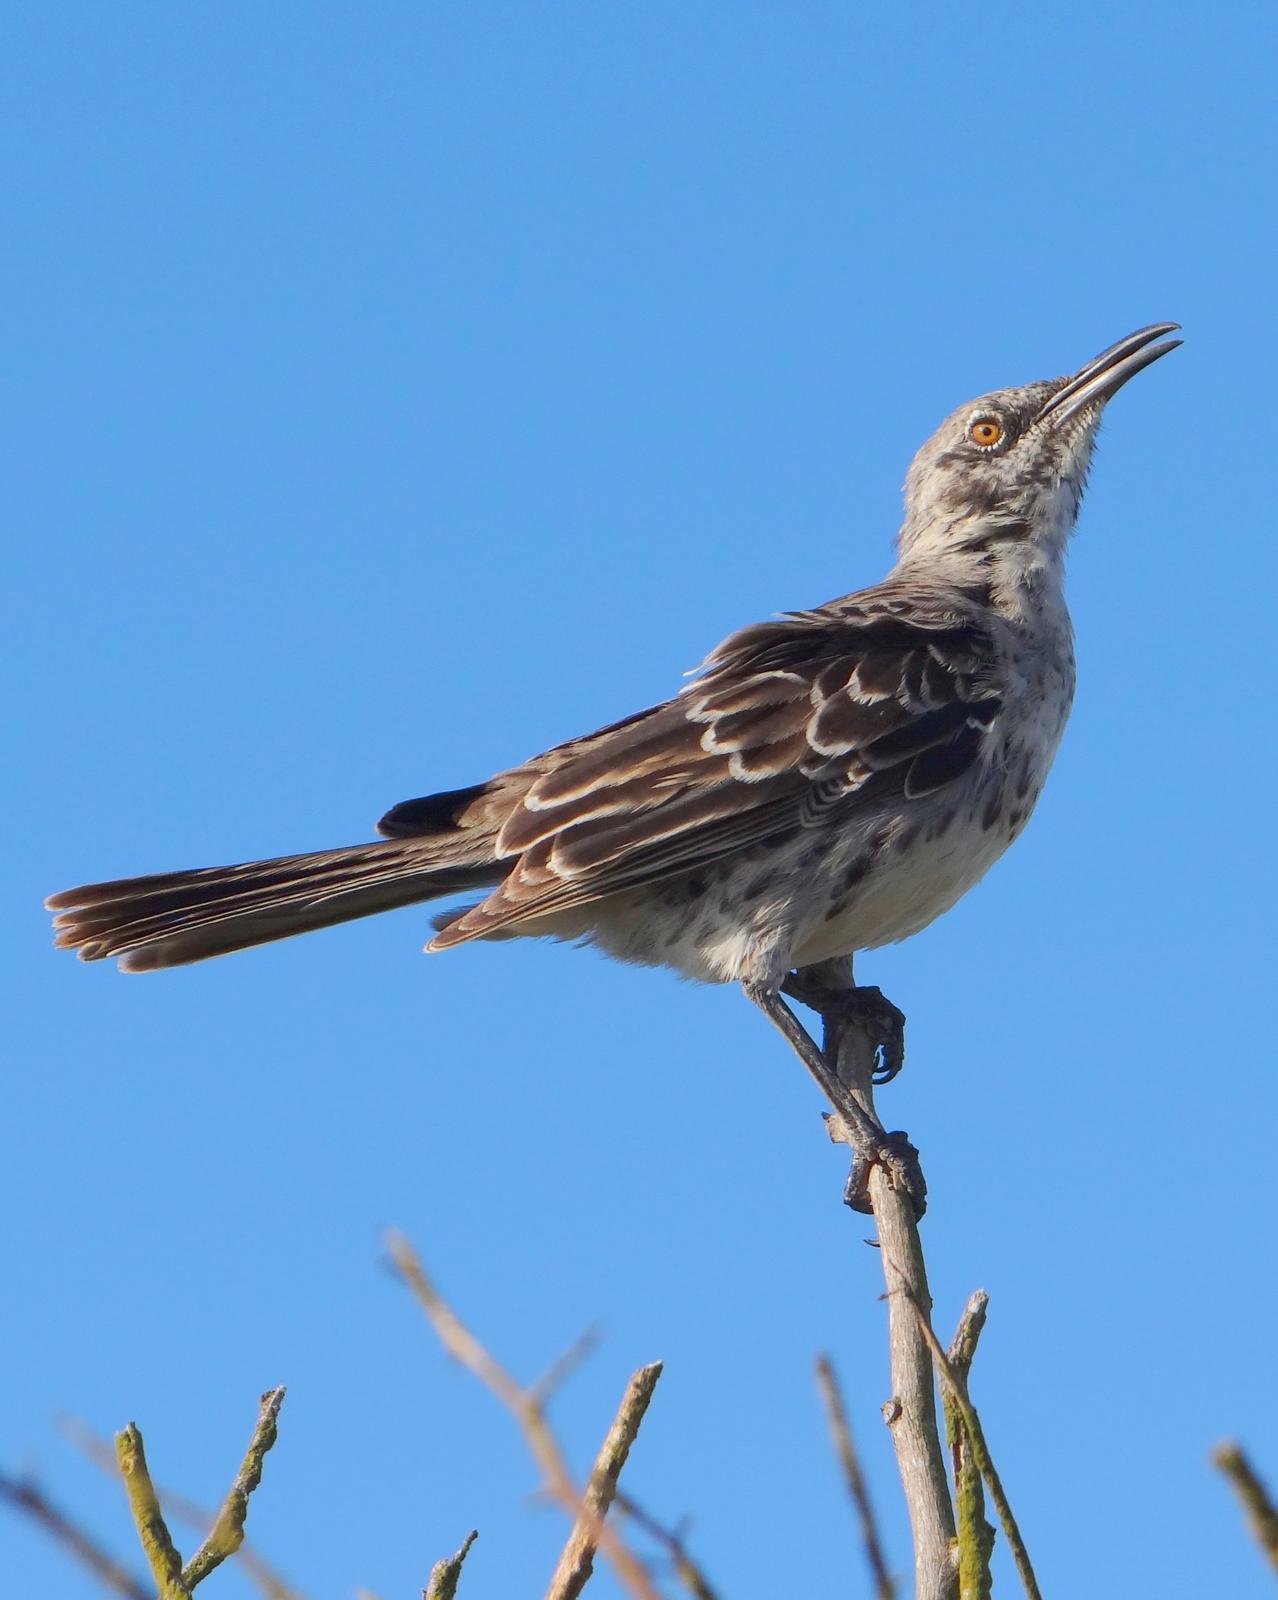 Española Mockingbird Photo by Todd A. Watkins